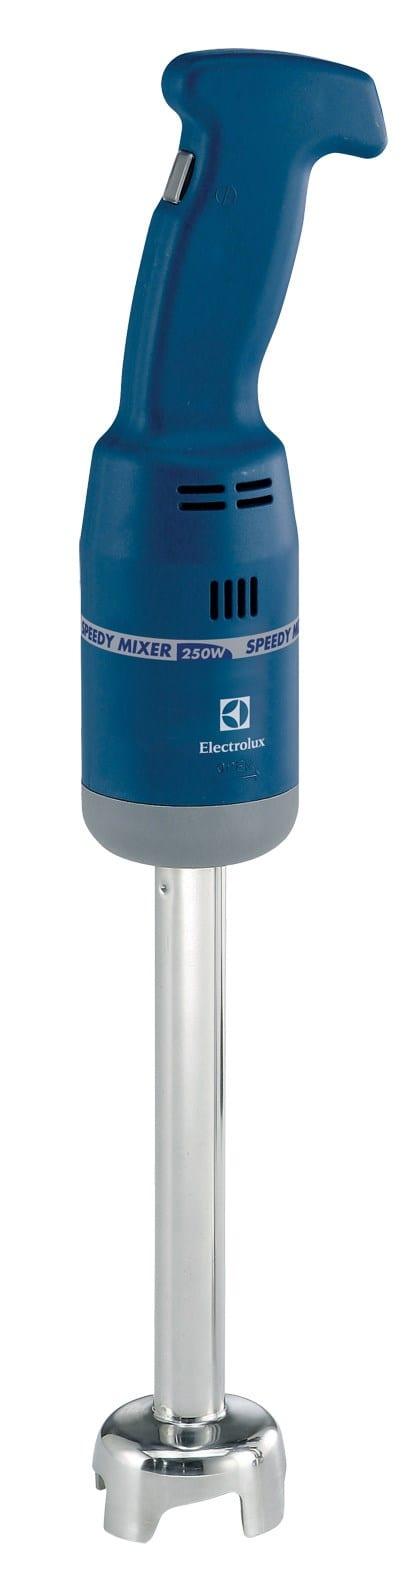 Portable Mixer, 250mm Shaft Image